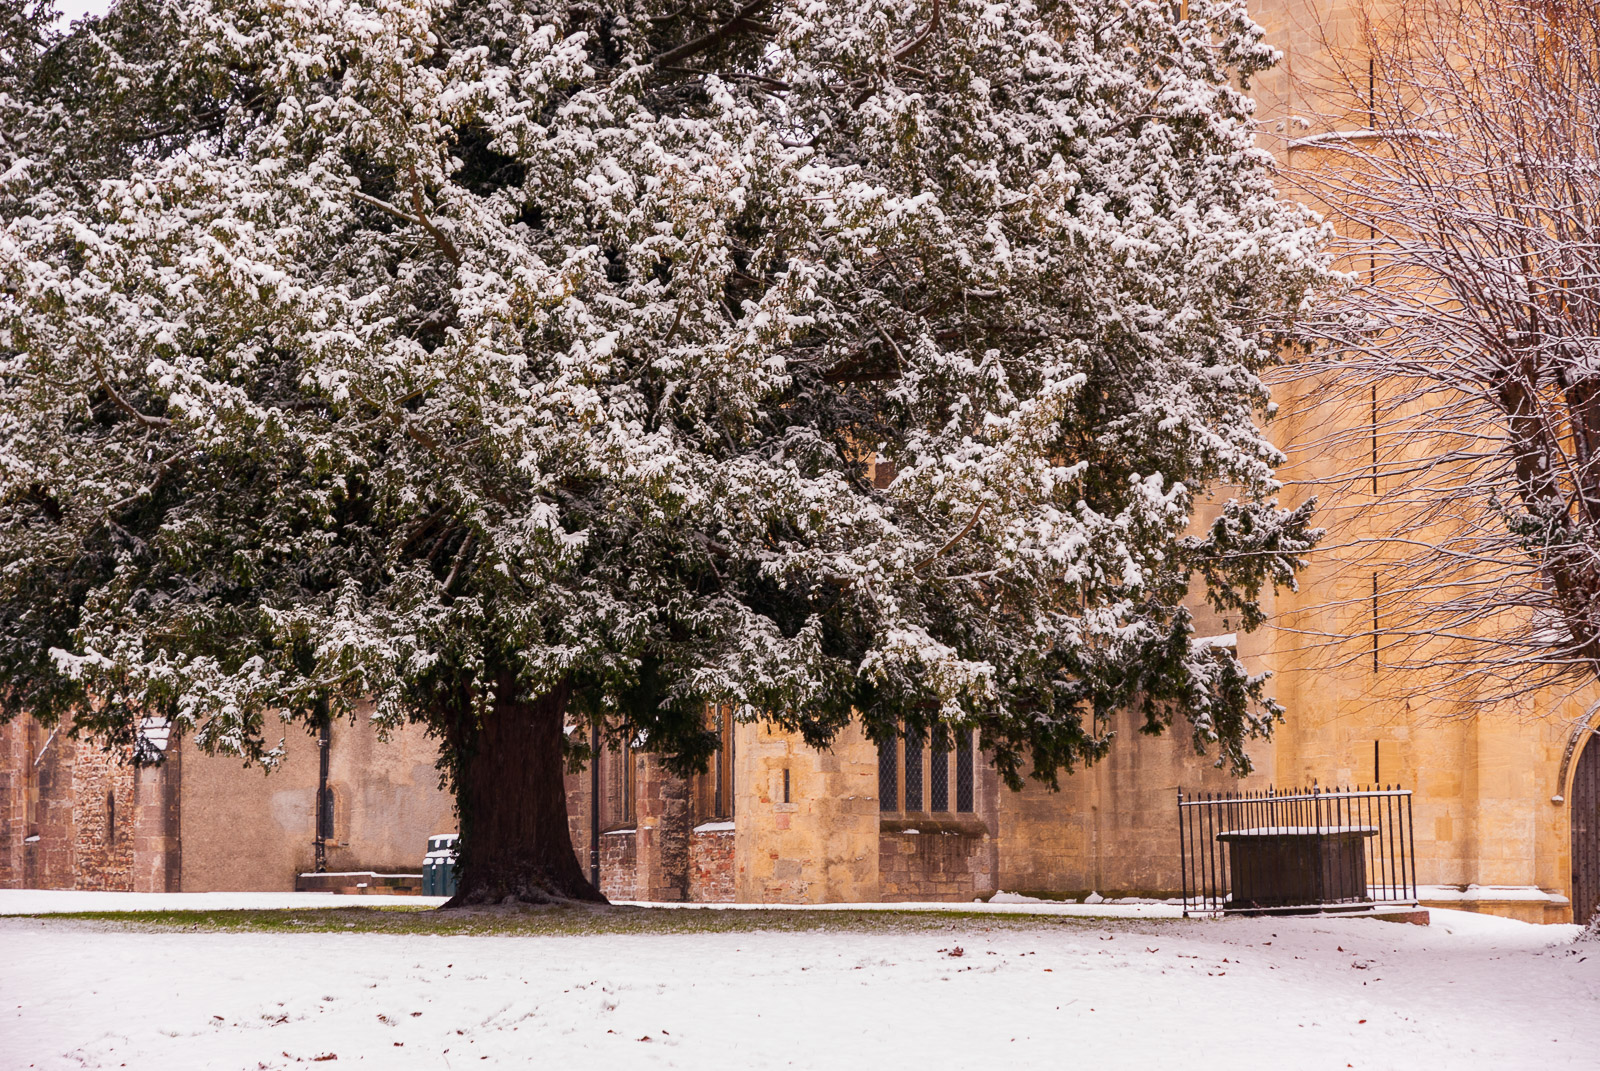 Snow at St Cuthberts Church - Wells, Somerset, UK. ID JB4_0009